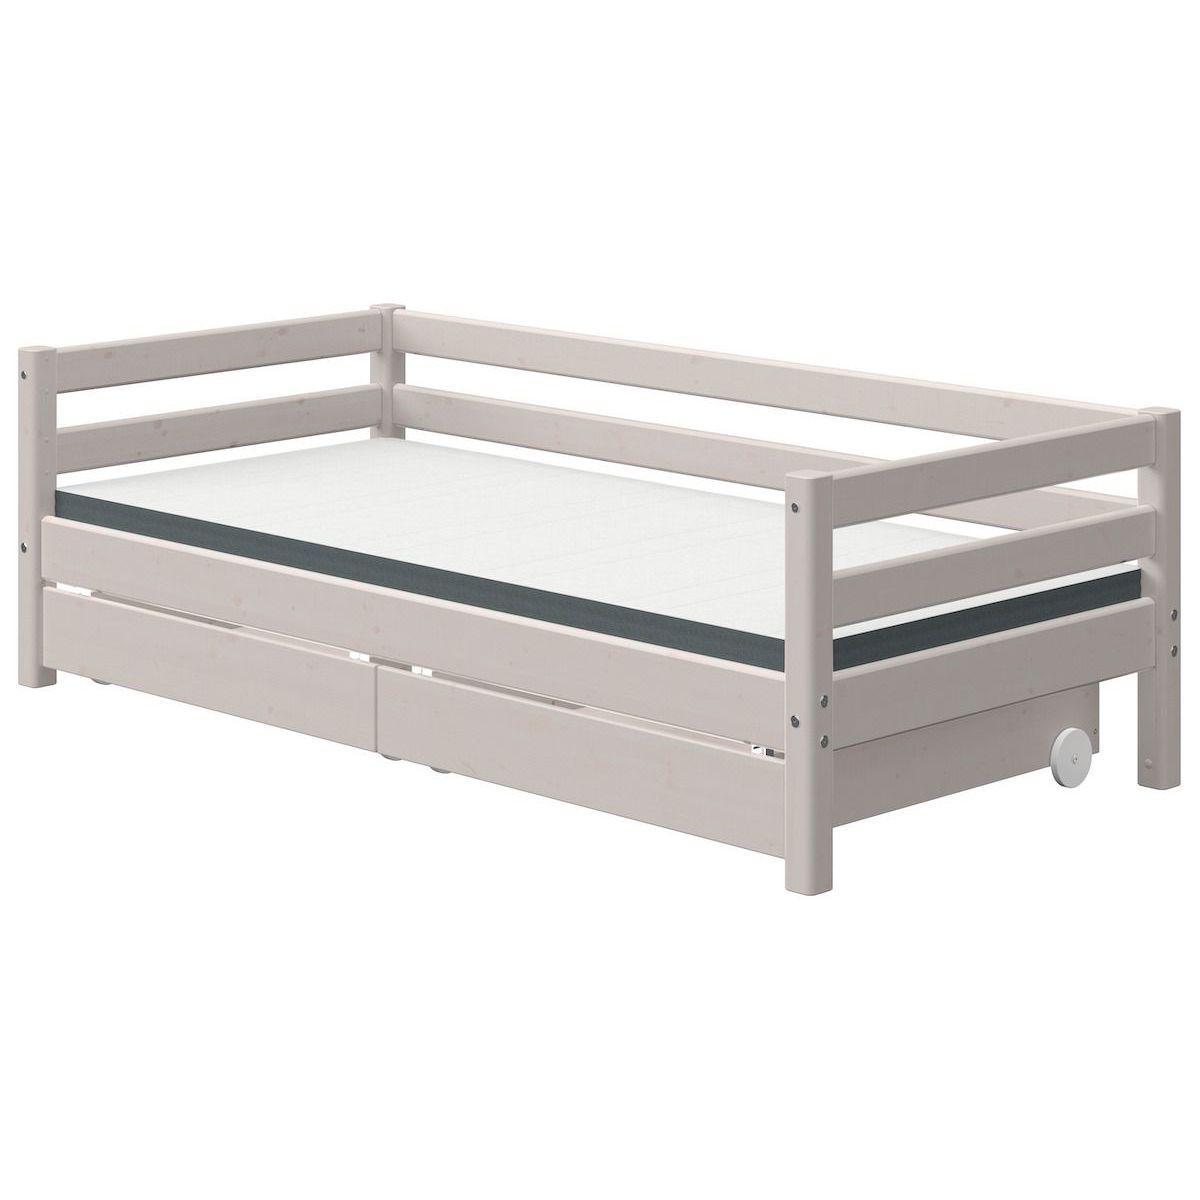 Tagesbett 90x190cm 2 Schubladen CLASSIC Flexa grey washed